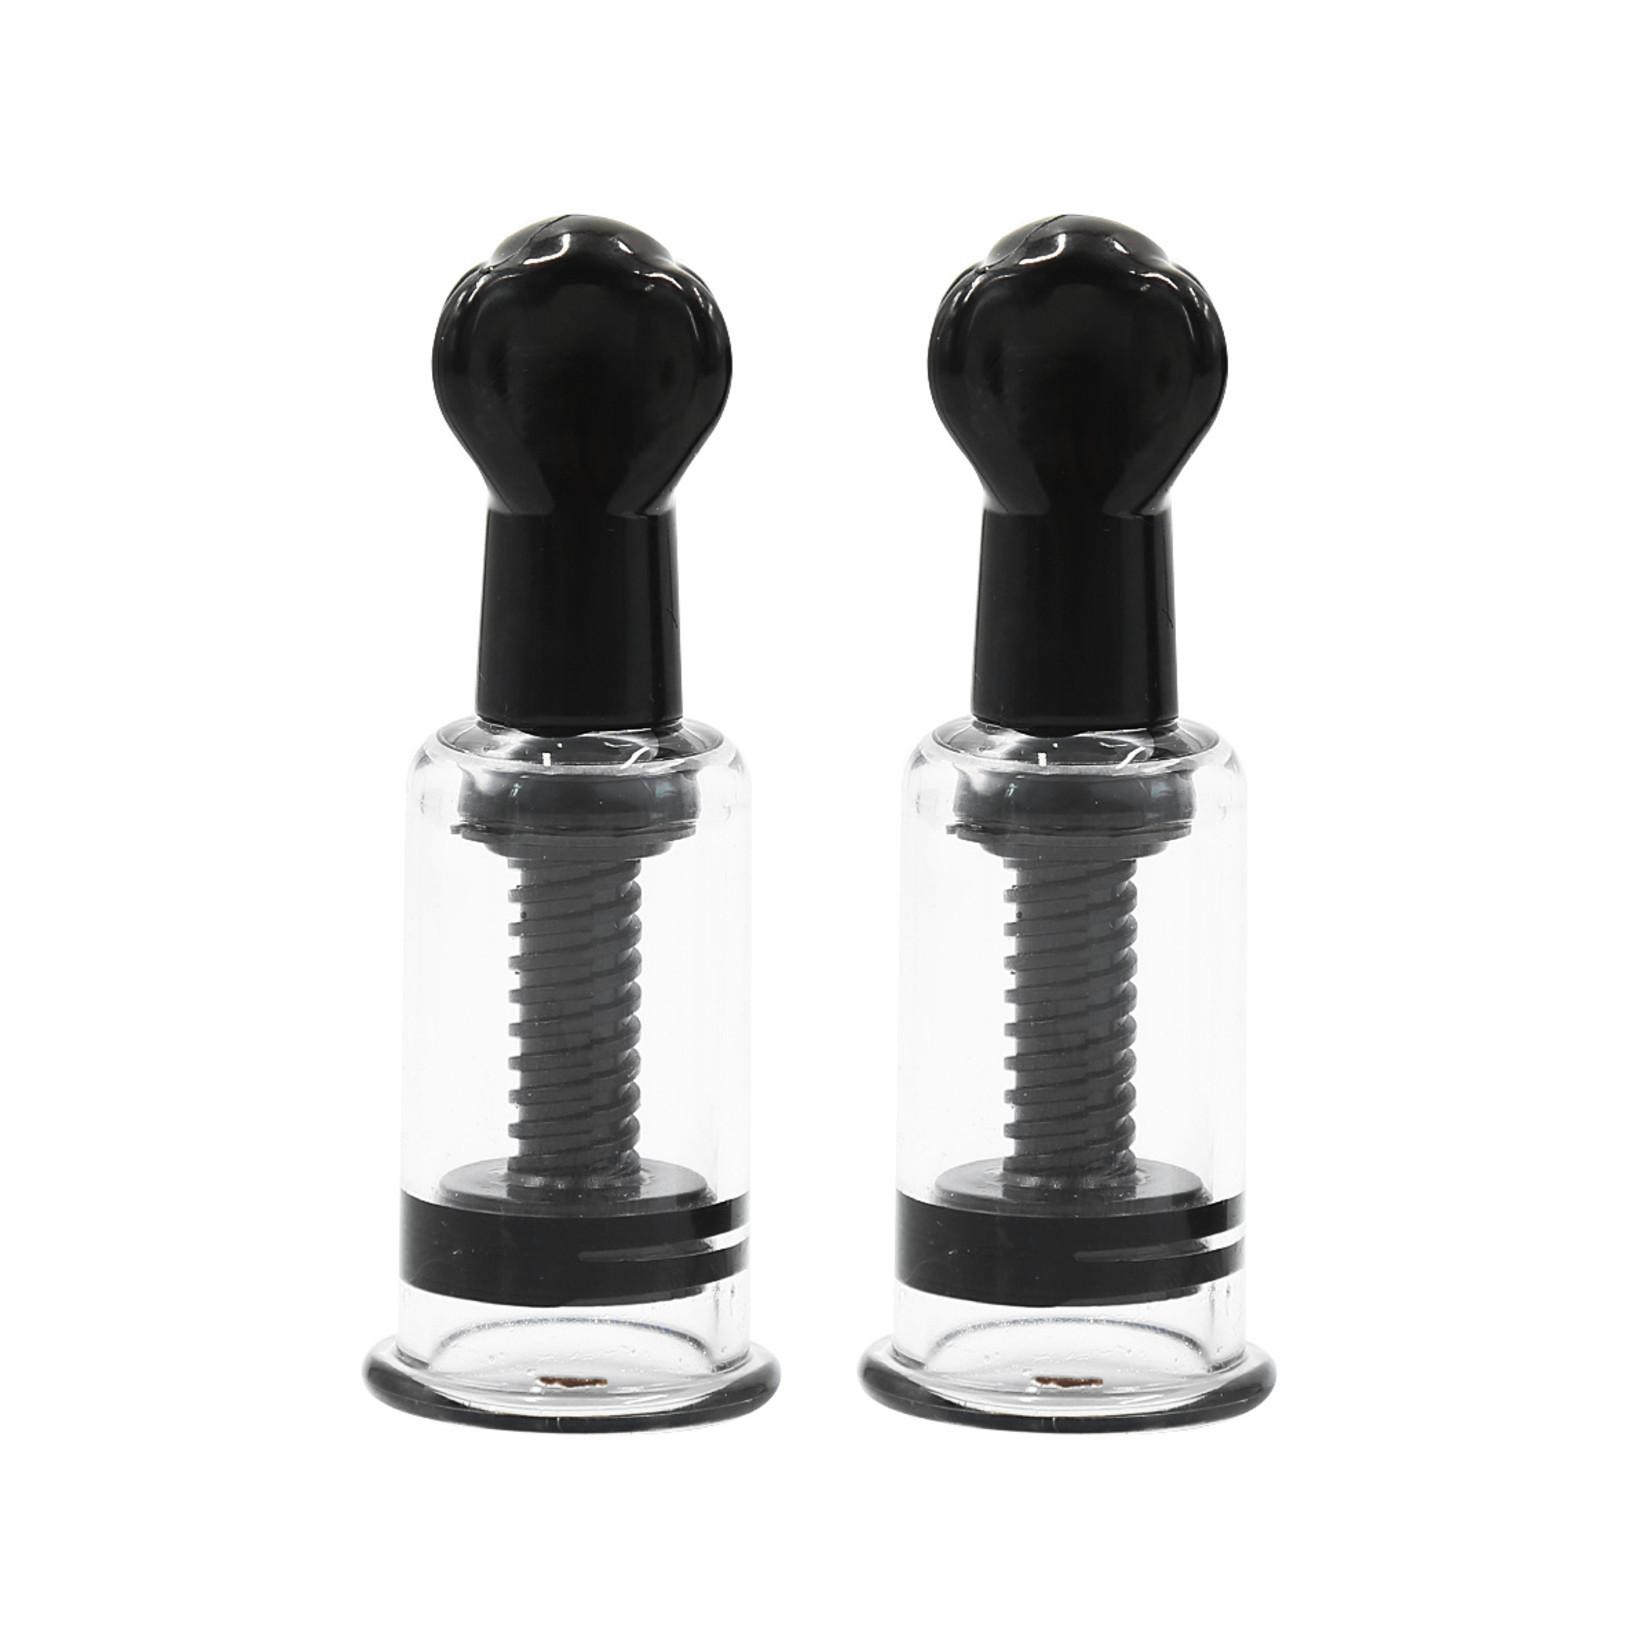 KIOTOS 2 Twist Cups Black S - 25 mm